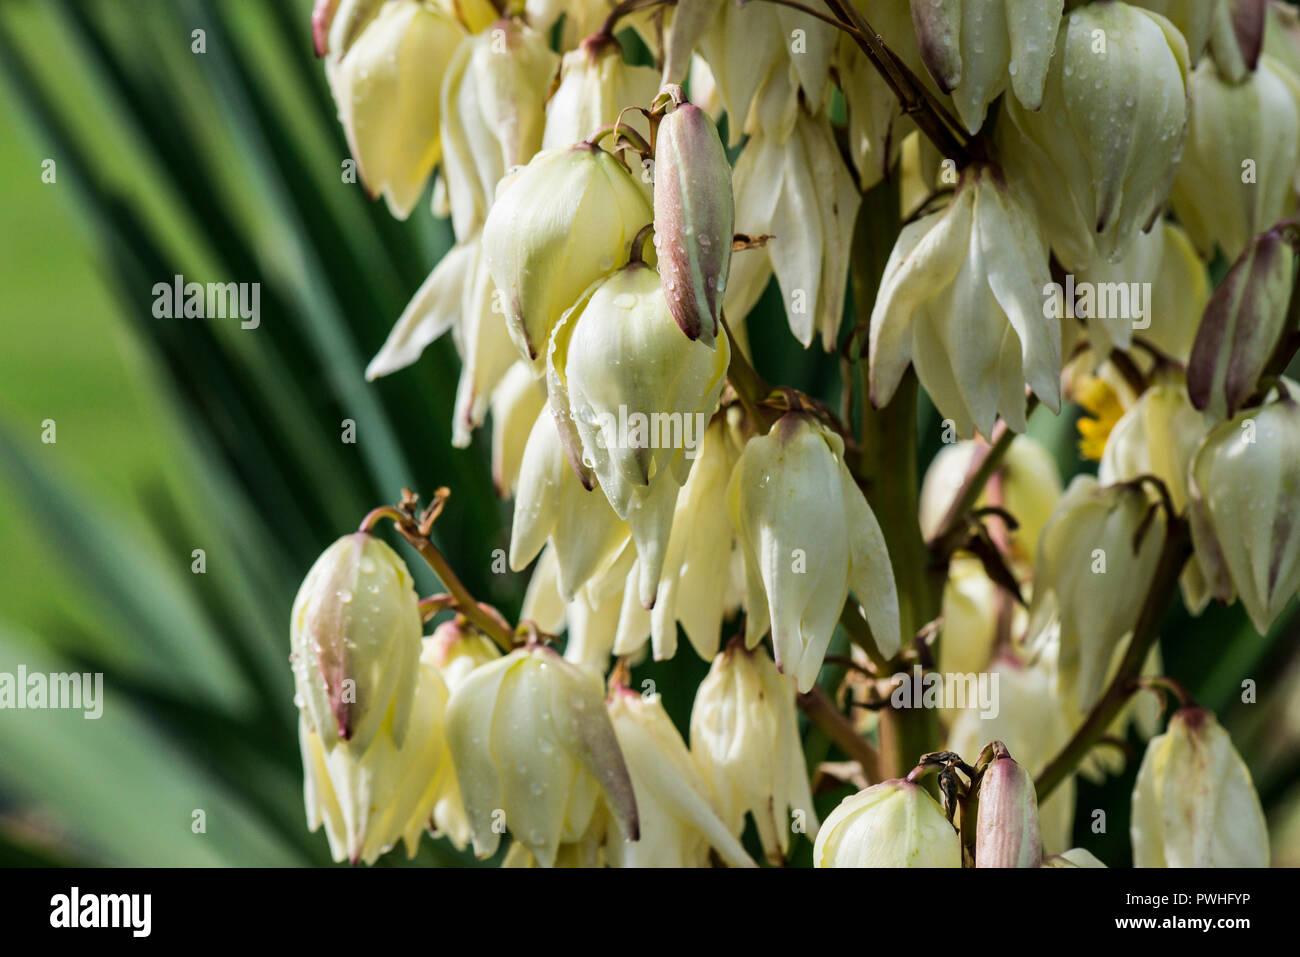 Rain drops on the flowers of a Spanish dagger (Yucca gloriosa) - Stock Image